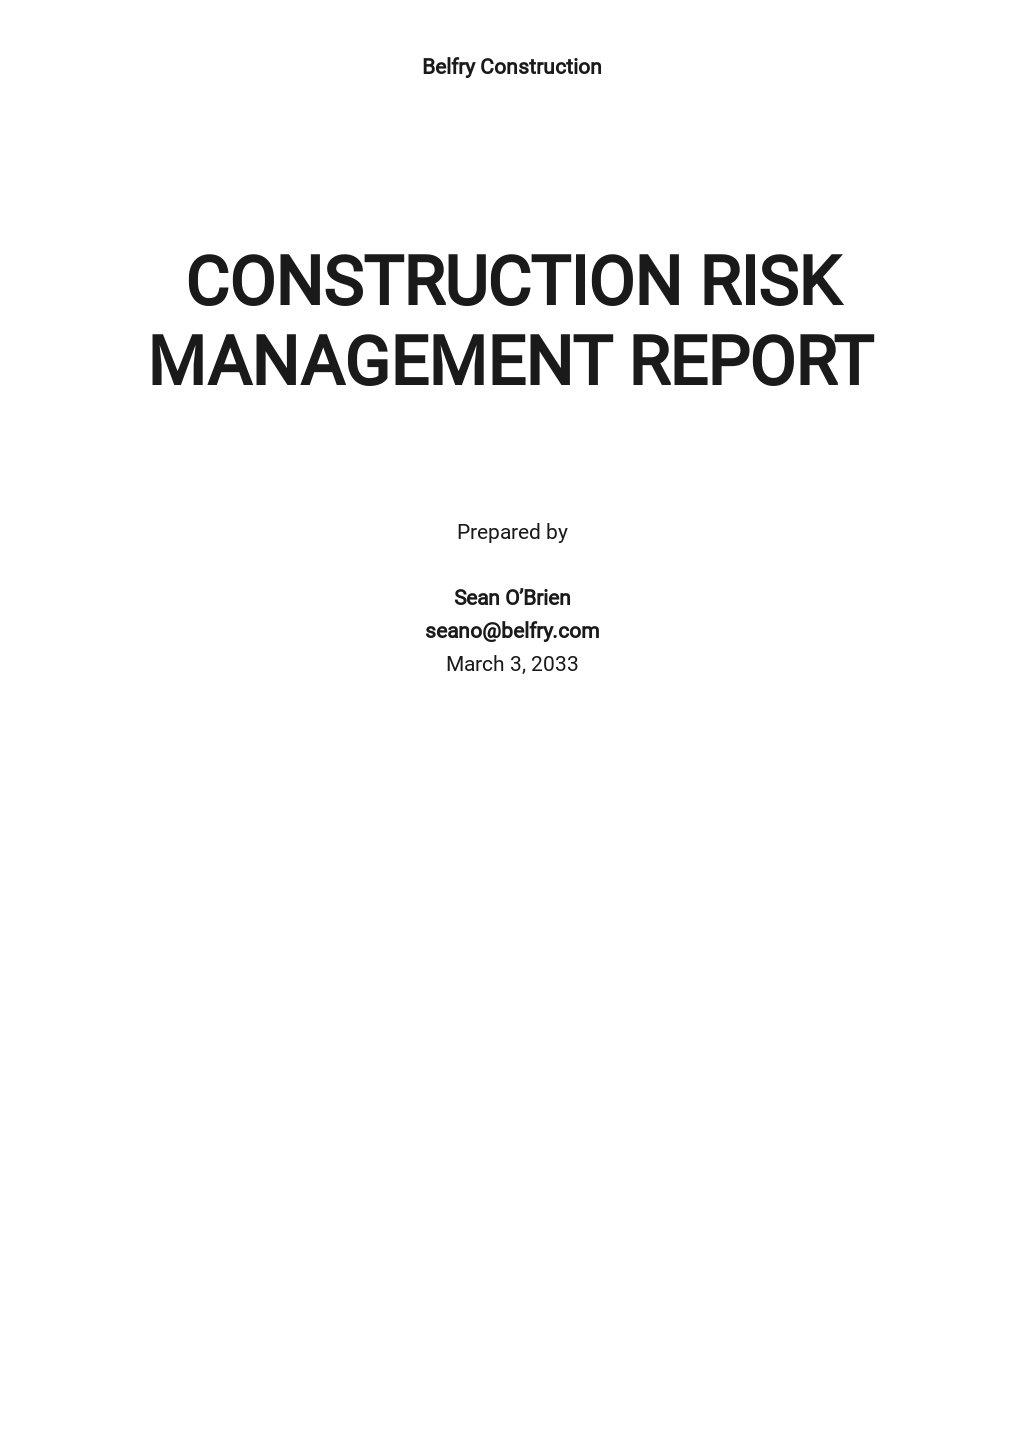 Construction Risk Management Report Template